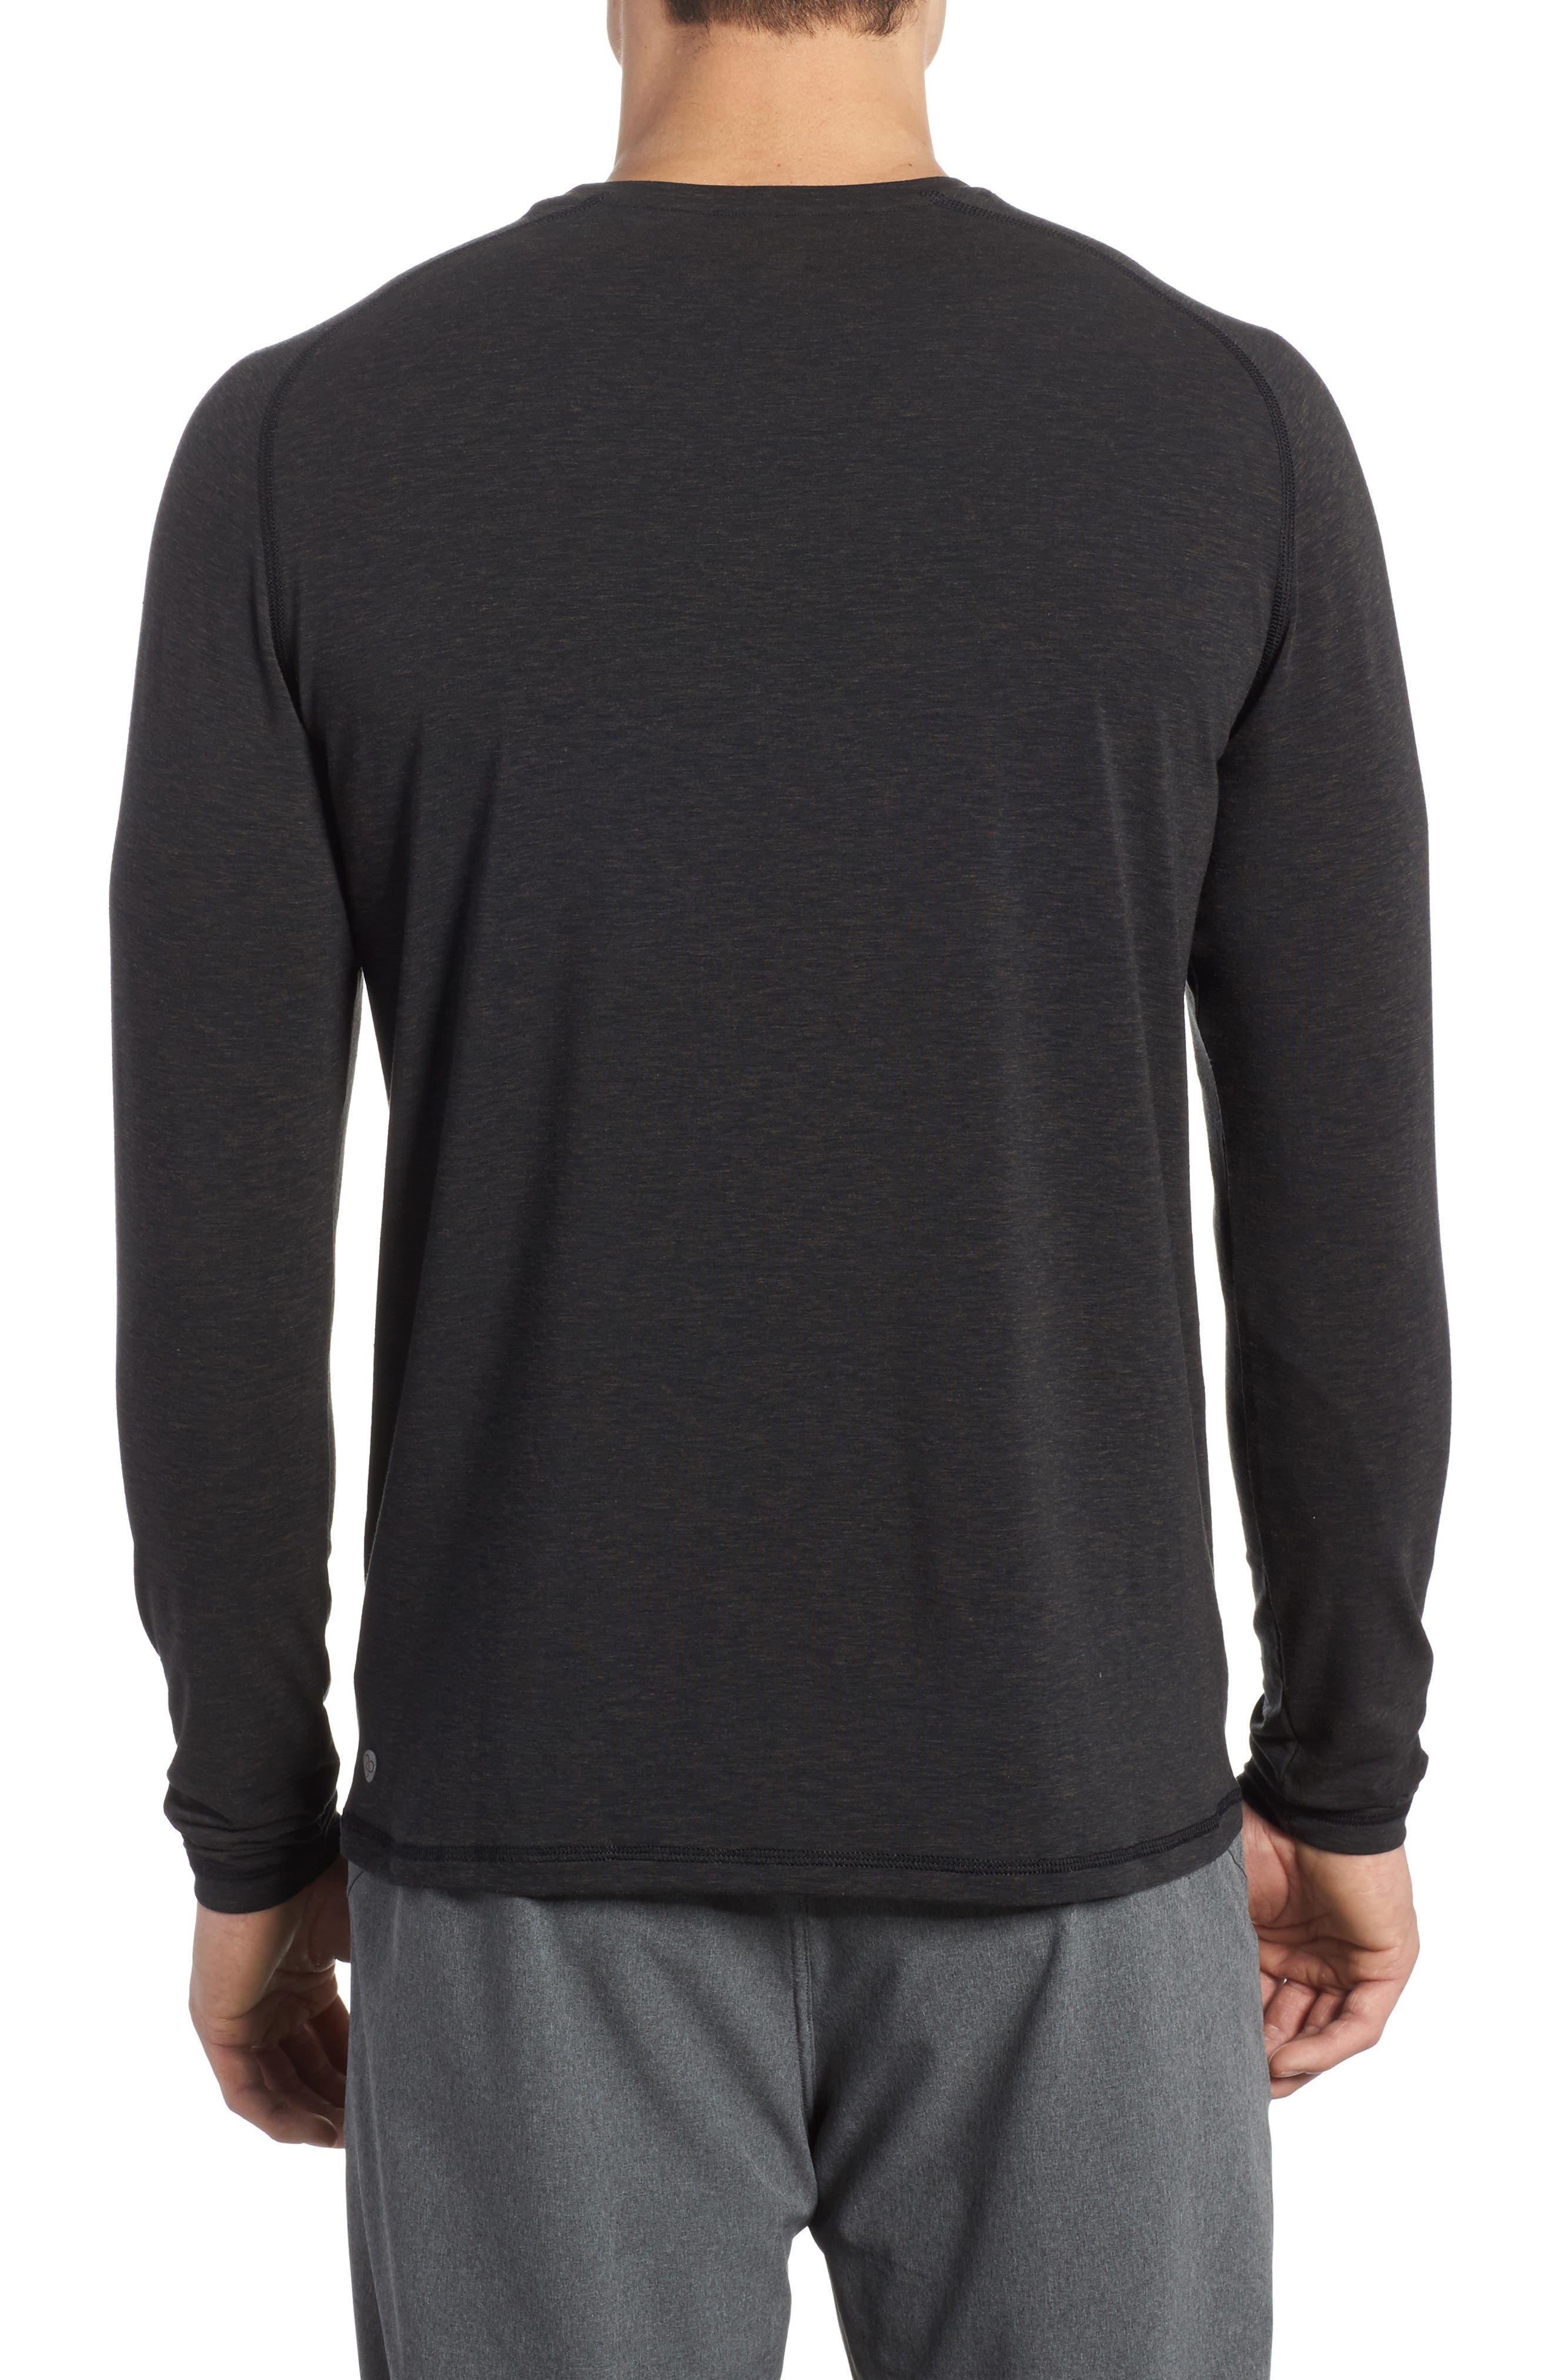 Long Sleeve T-Shirt,                             Alternate thumbnail 2, color,                             BLACK OXIDE HEATHER